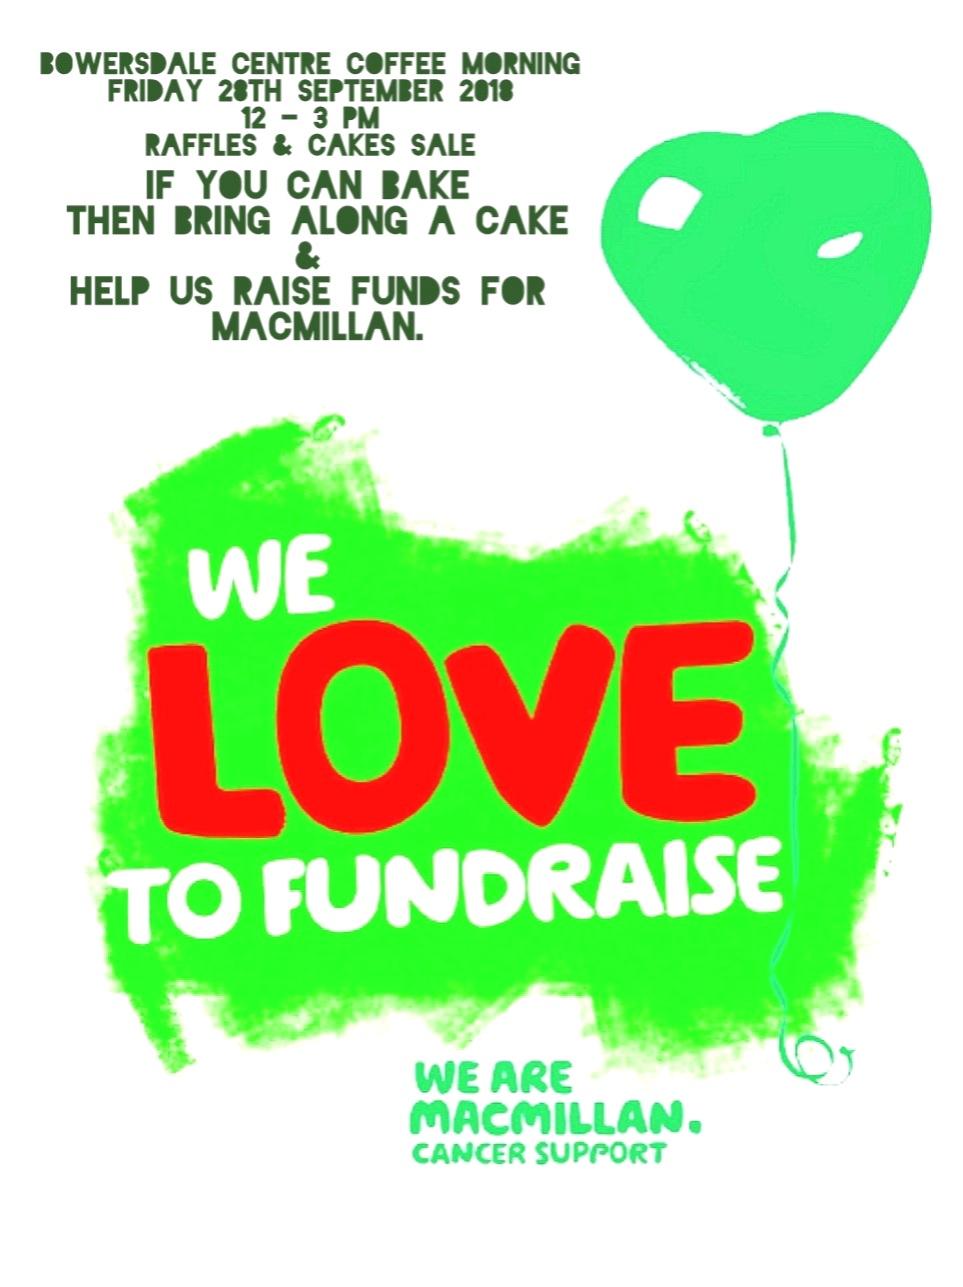 Bowersdale - Macmillan fundraiser